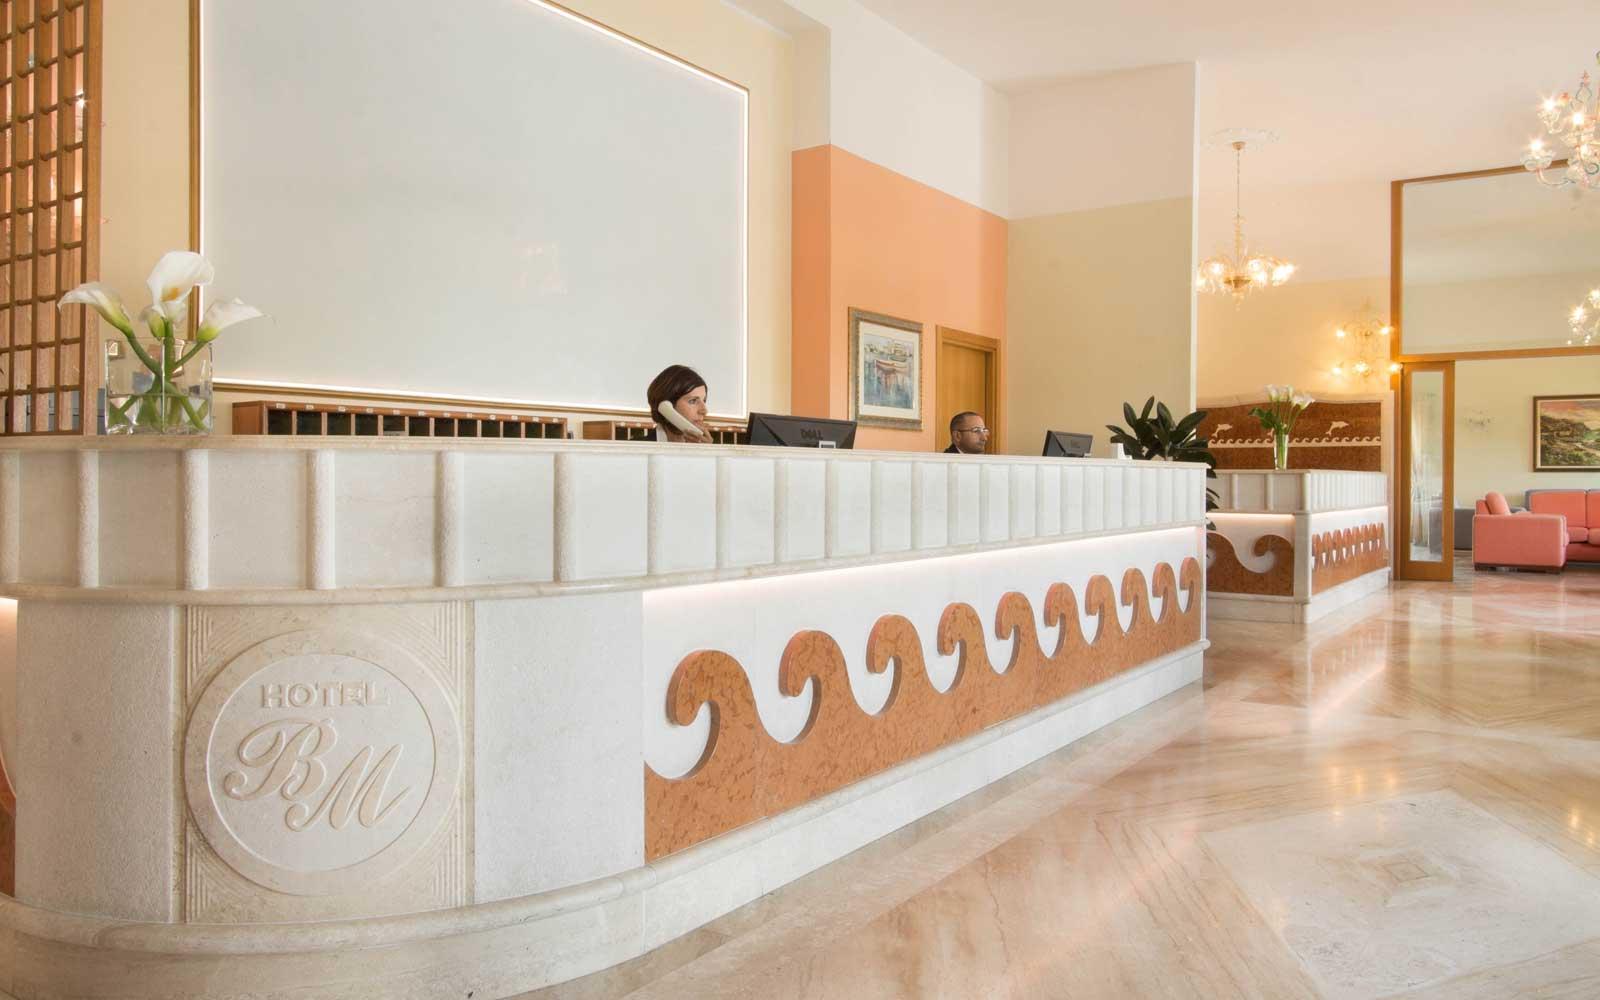 Reception at Hotel Brancamaria